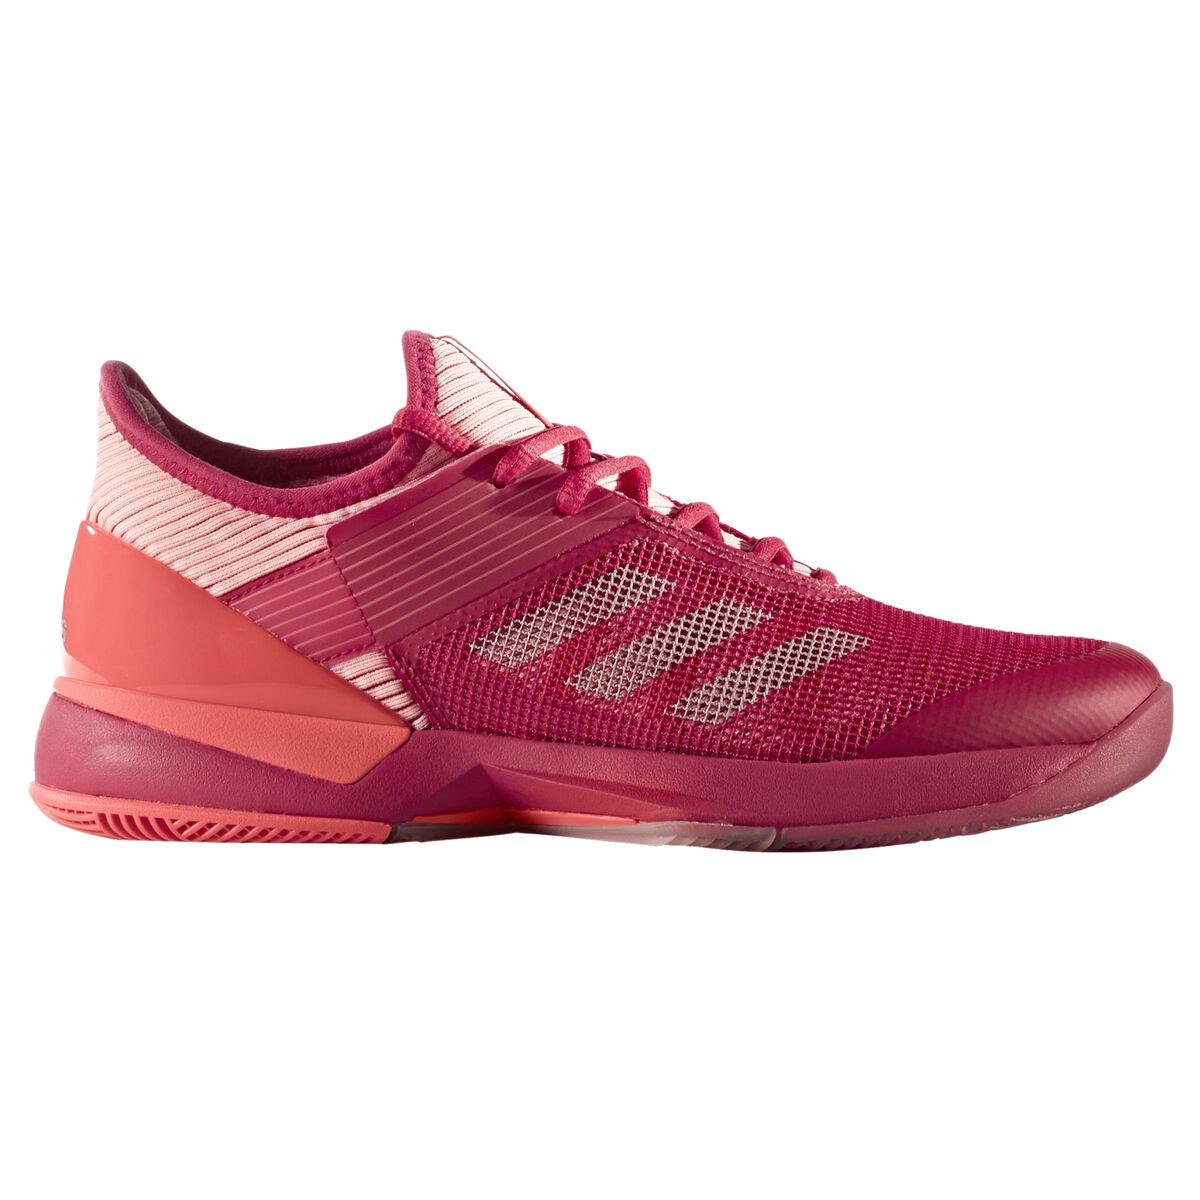 buy online b6d61 cc960 adidas adizero Ubersonic 3 Women  39 s Tennis Shoes - Pink Zoom Image